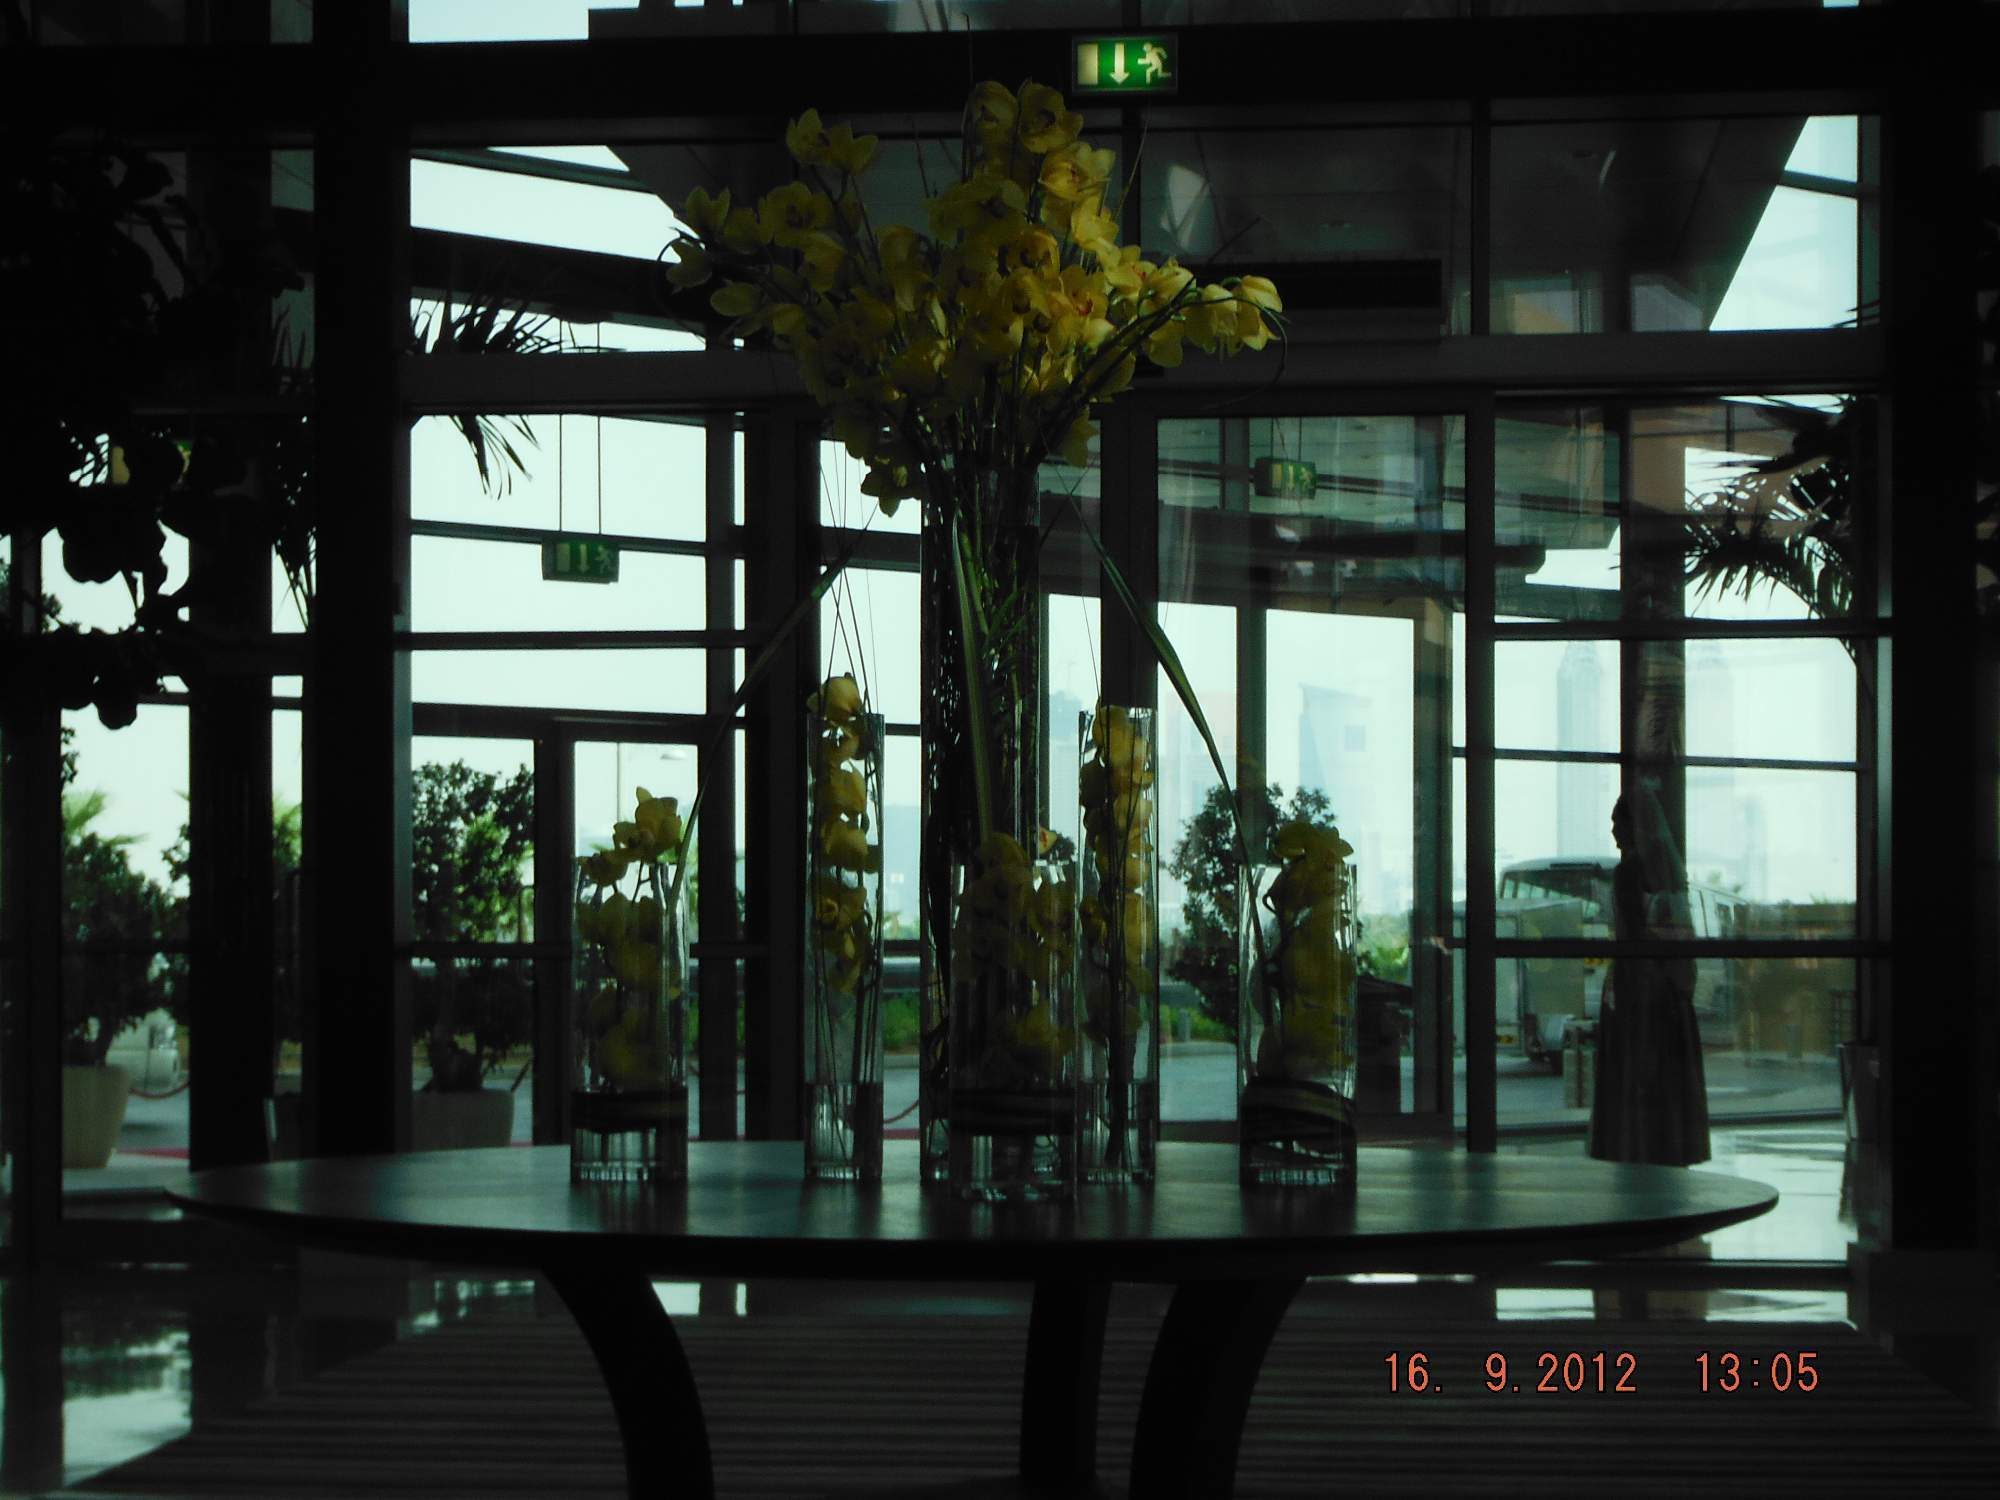 http://img24.rajce.idnes.cz/d2403/13/13214/13214242_a1e43f49e51a1daa7632f800d4edae3f/images/SAE412.jpg